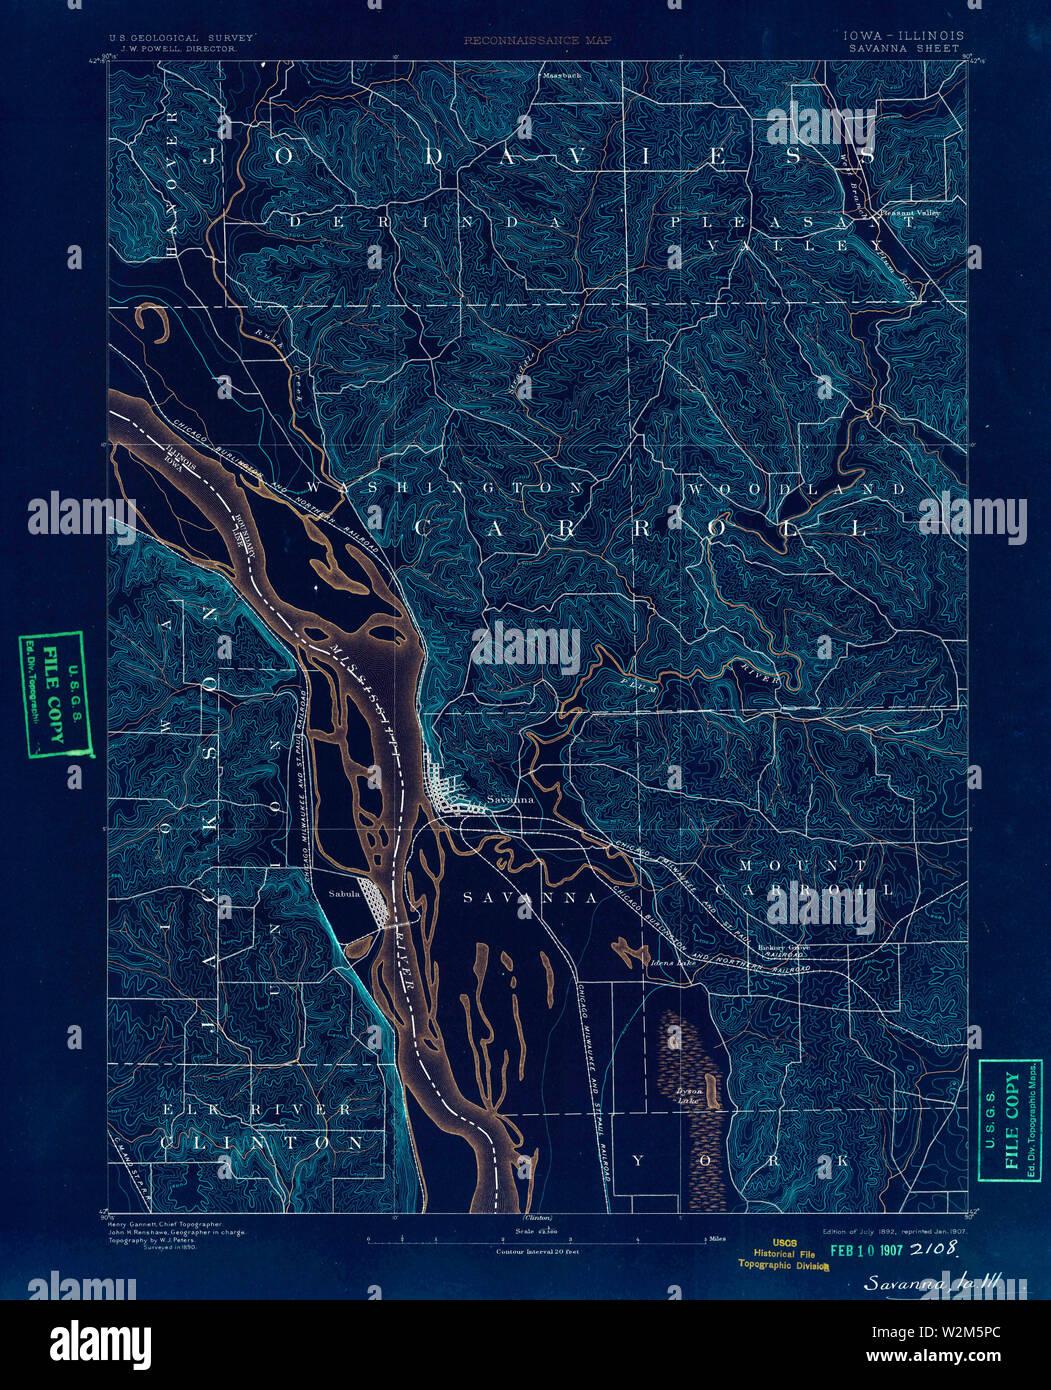 USGS TOPO Map Iowa IA Savanna 175477 1892 62500 Inverted ... Iowa Interstate Map on iowa map by county, davenport iowa map, iowa roadway map, wisconsin central map, iowa map of america, iowa driving map, iowa travel map, iowa map usa, i-80 map, western railway of alabama map, ne iowa map, iowa metro map, iowa road map, iowa maps with major cities, iowa utility map, google maps iowa street map, illinois railway museum map, east broad top map, saint charles county zip code map, iowa map with mile markers,